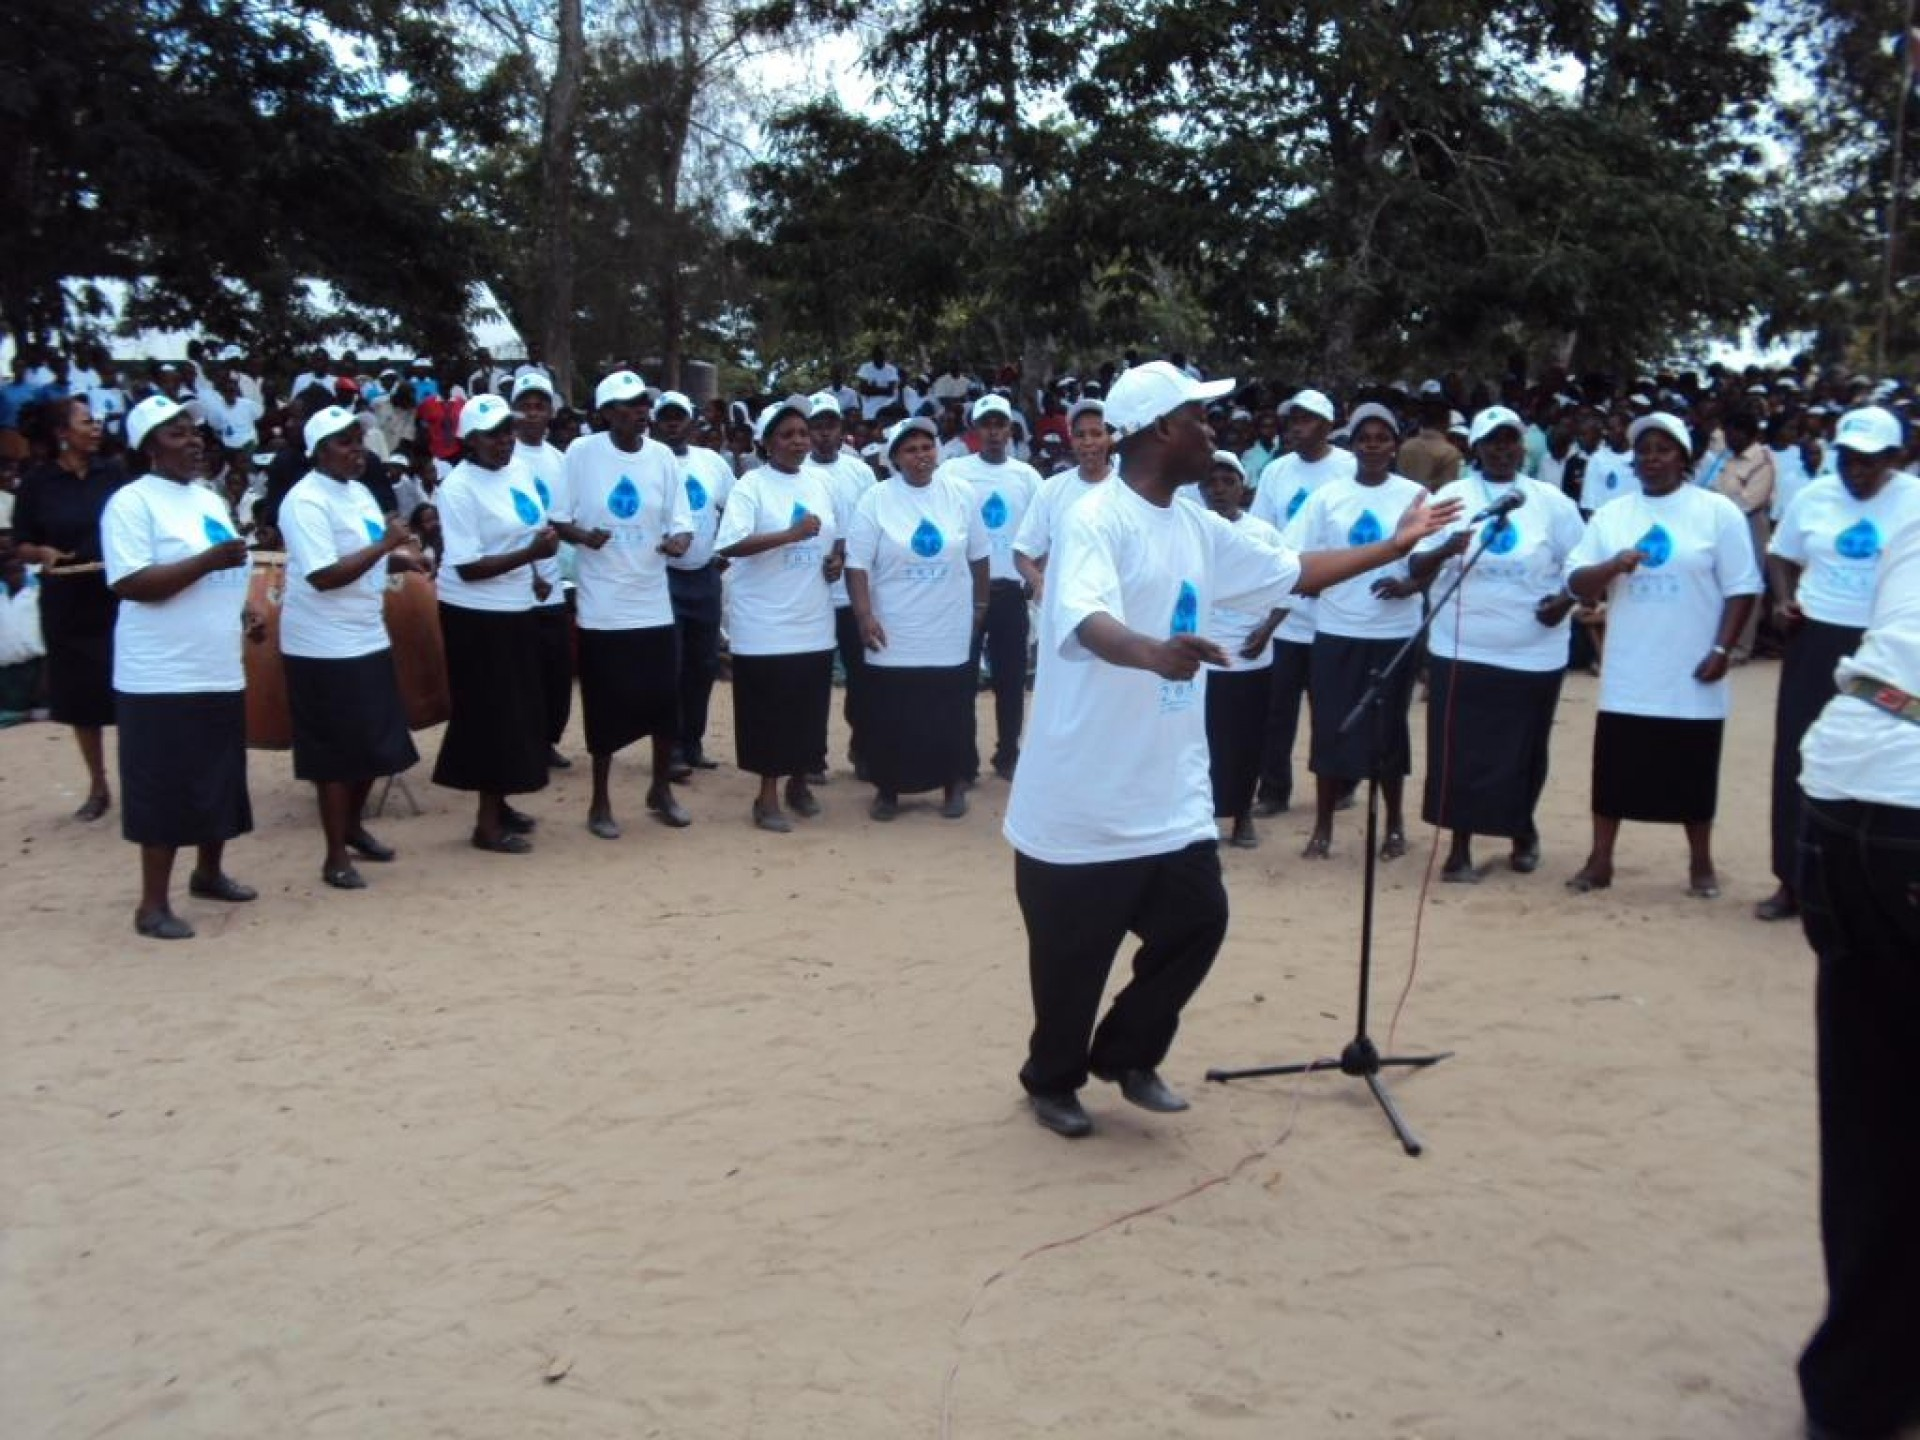 020 Save Water Essay Wikipedia World Day  Choir Singing 28445946004329 Awful Life In Tamil Gujarati1920